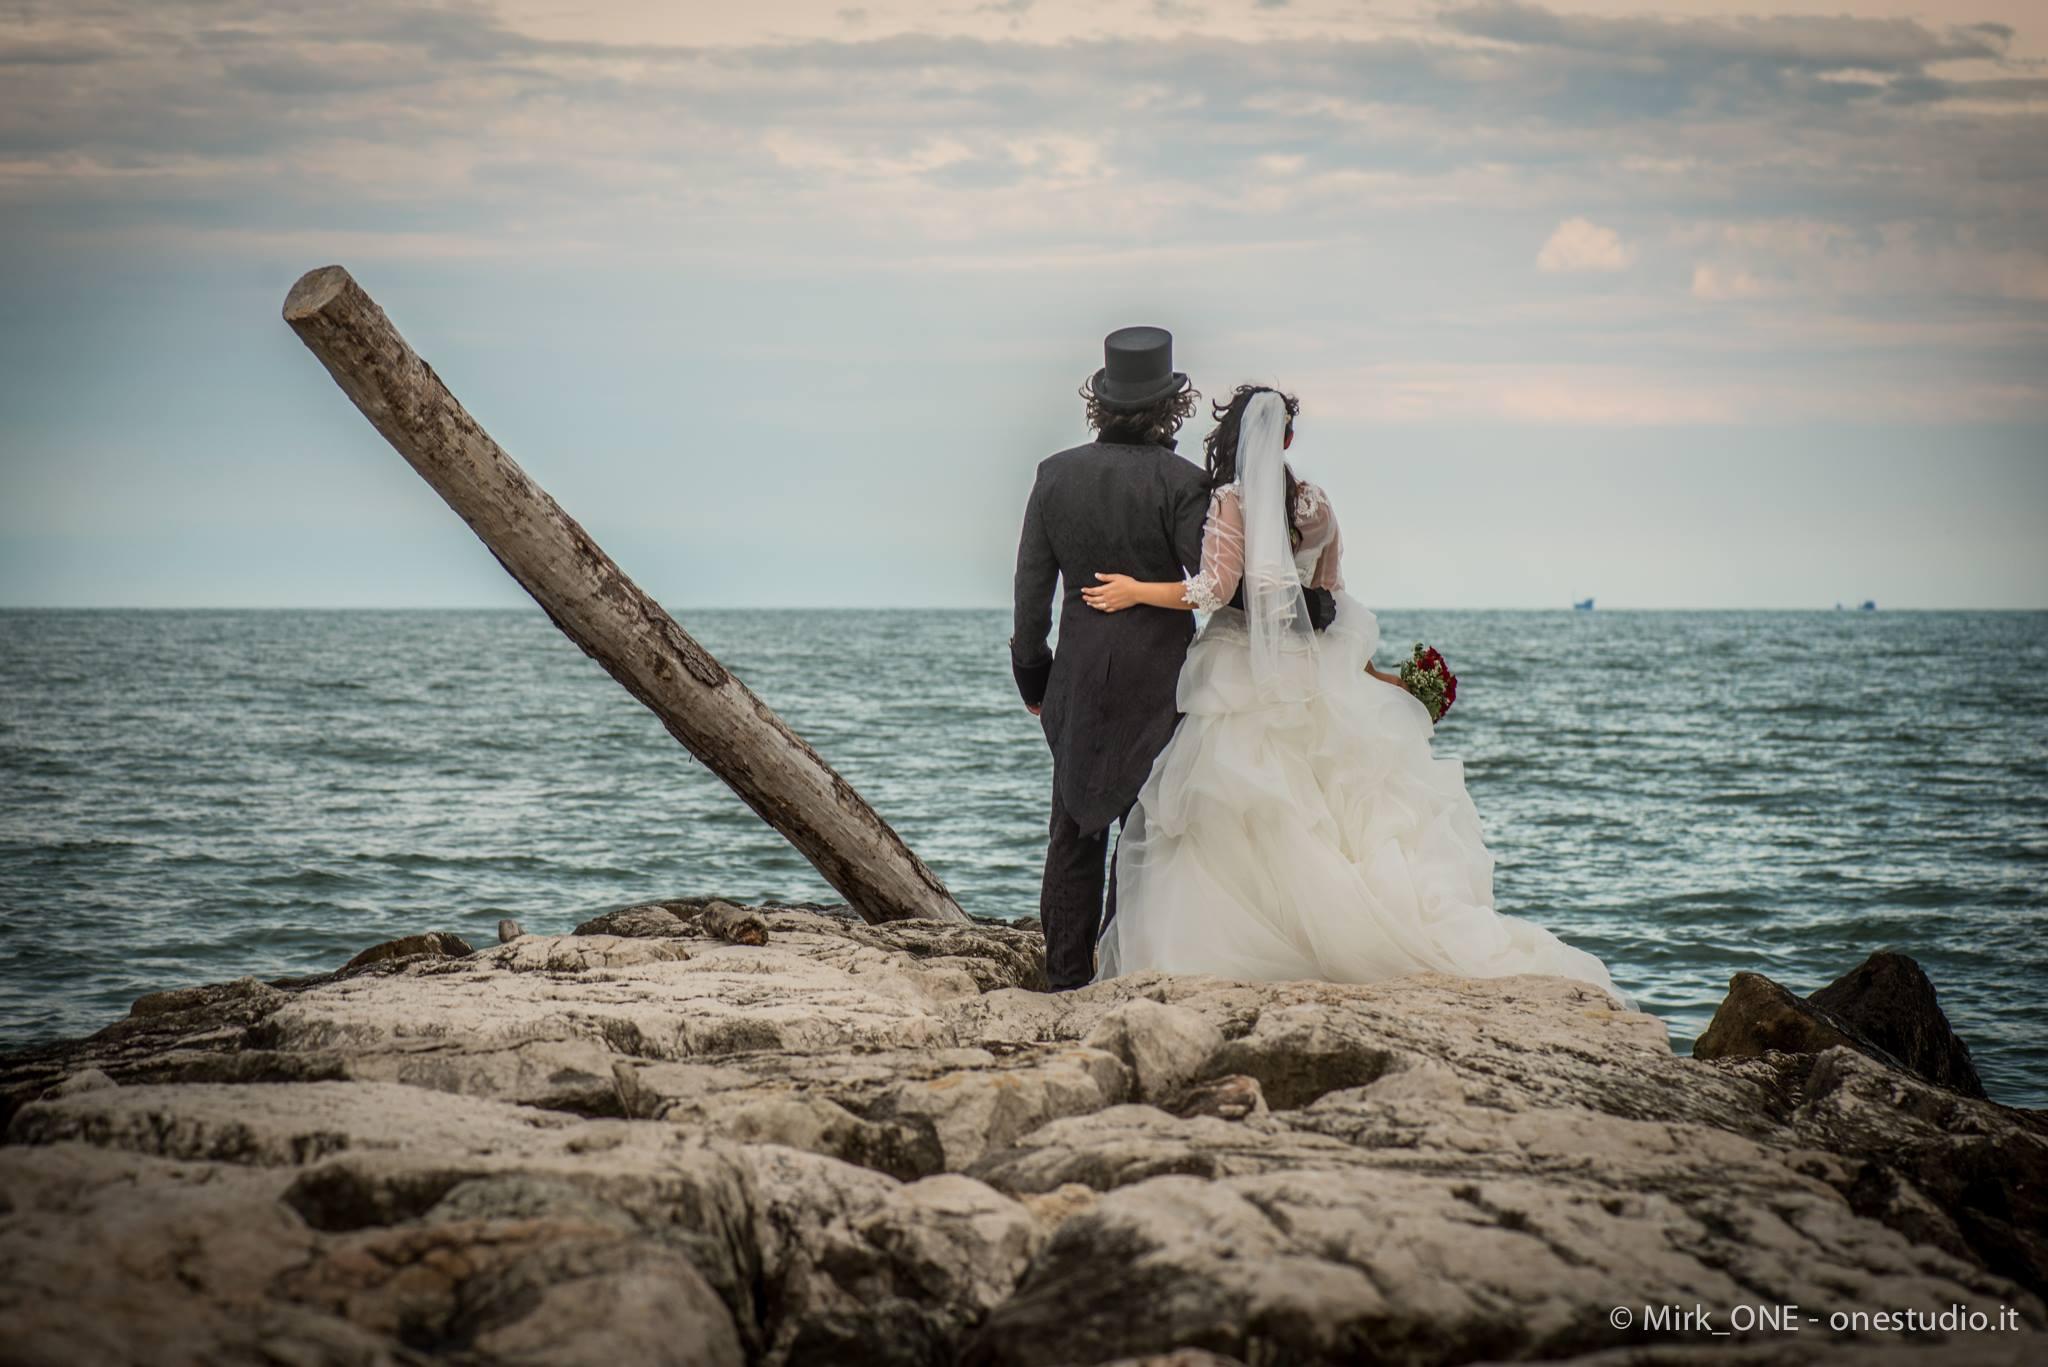 https://lnx.mirkone.it/wp-content/uploads/2015/07/mirk_ONE-fotografo-matrimonio-00824.jpg